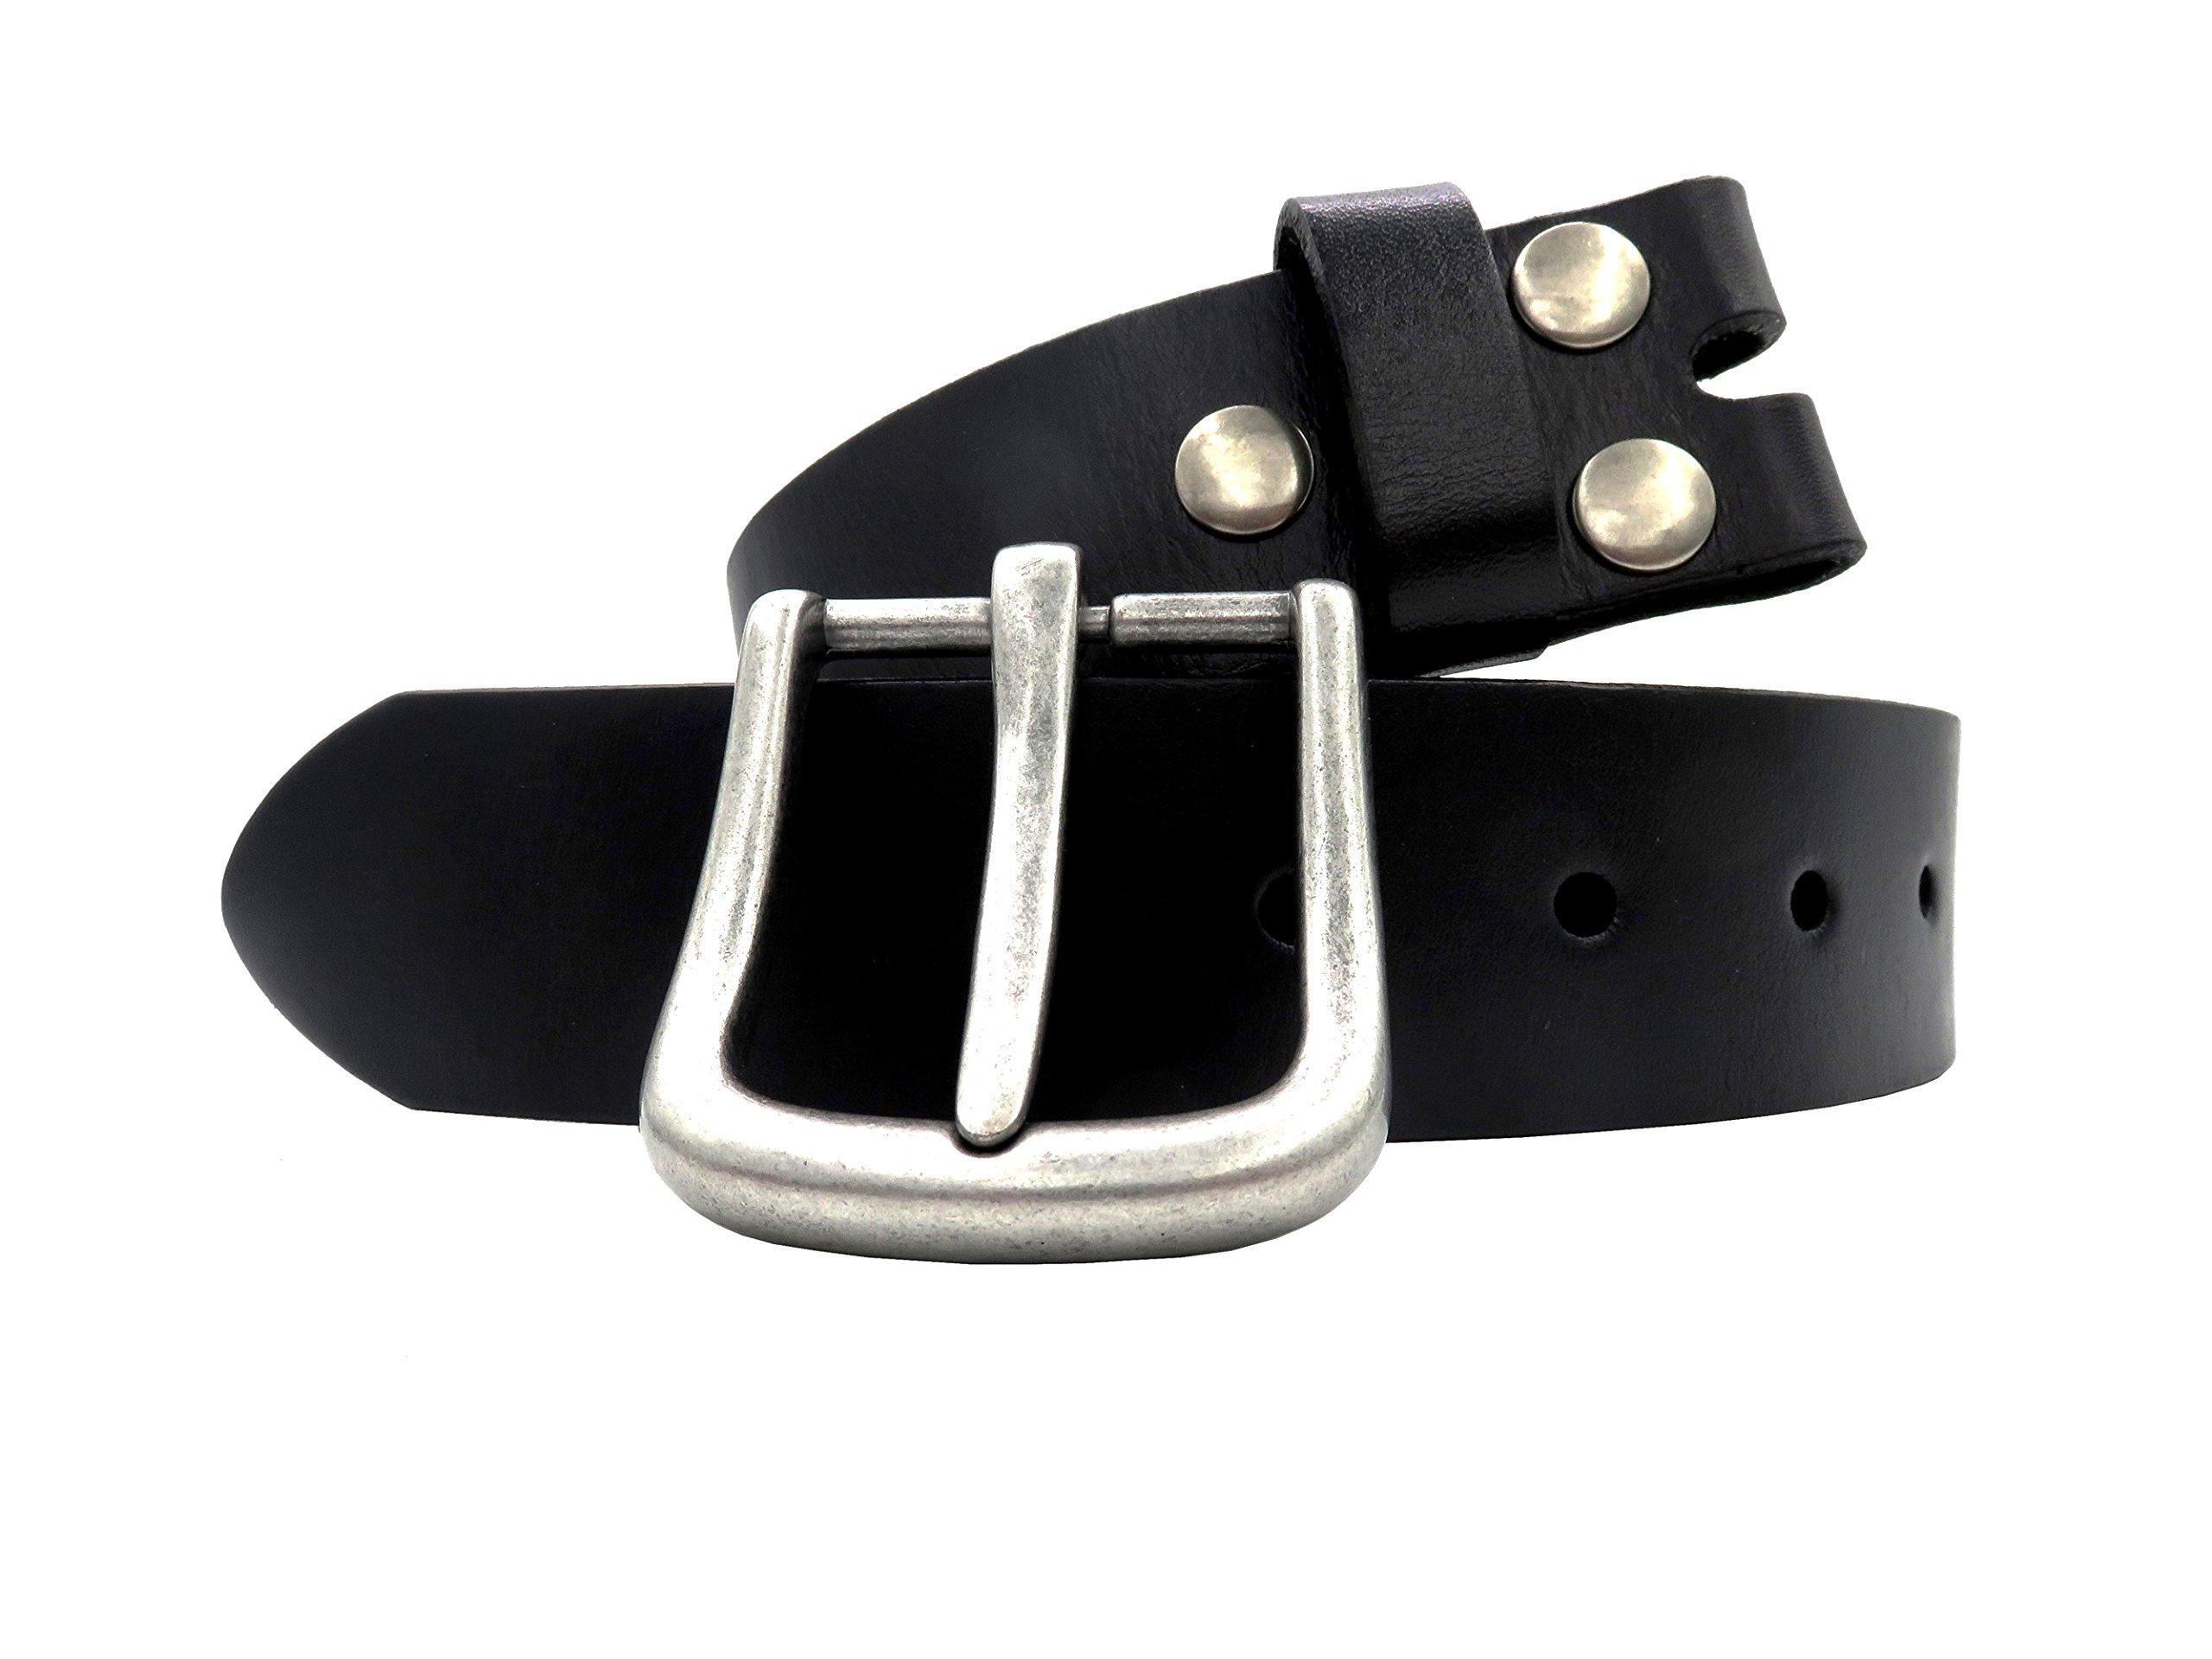 Men's Genuine Leather Belt 38mm(1-1/2'') Cowhide Strap Snap on Belt Full Grain Vintage Finish with Removable Buckle Waist Belts for Jeans - Black